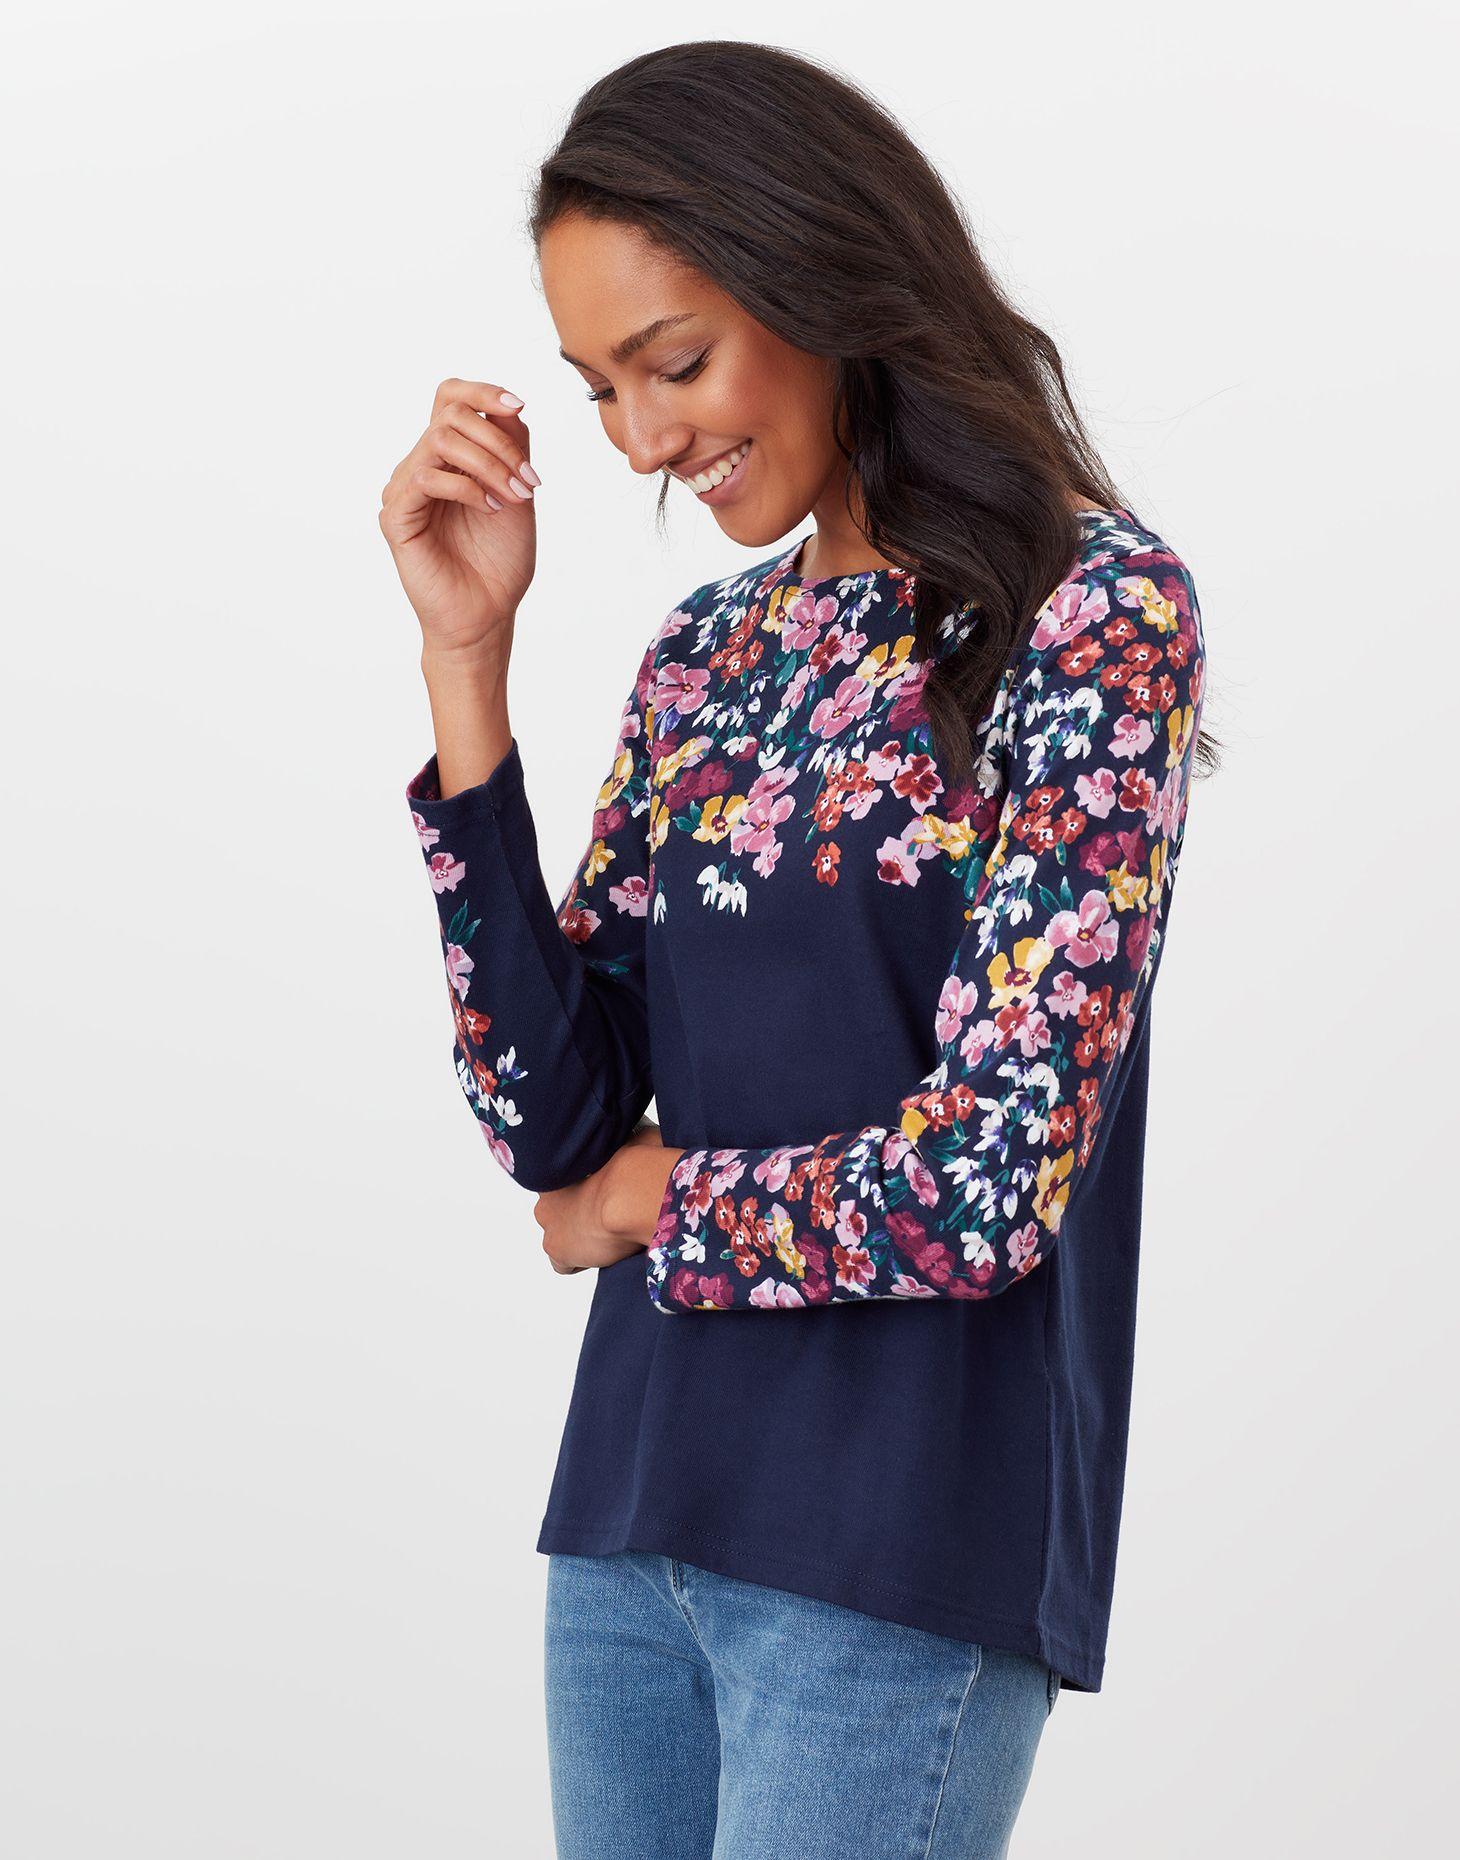 Joules Ladies Harbour Print Cotton Long Sleeve Jersey Top Navy Stripe Floral